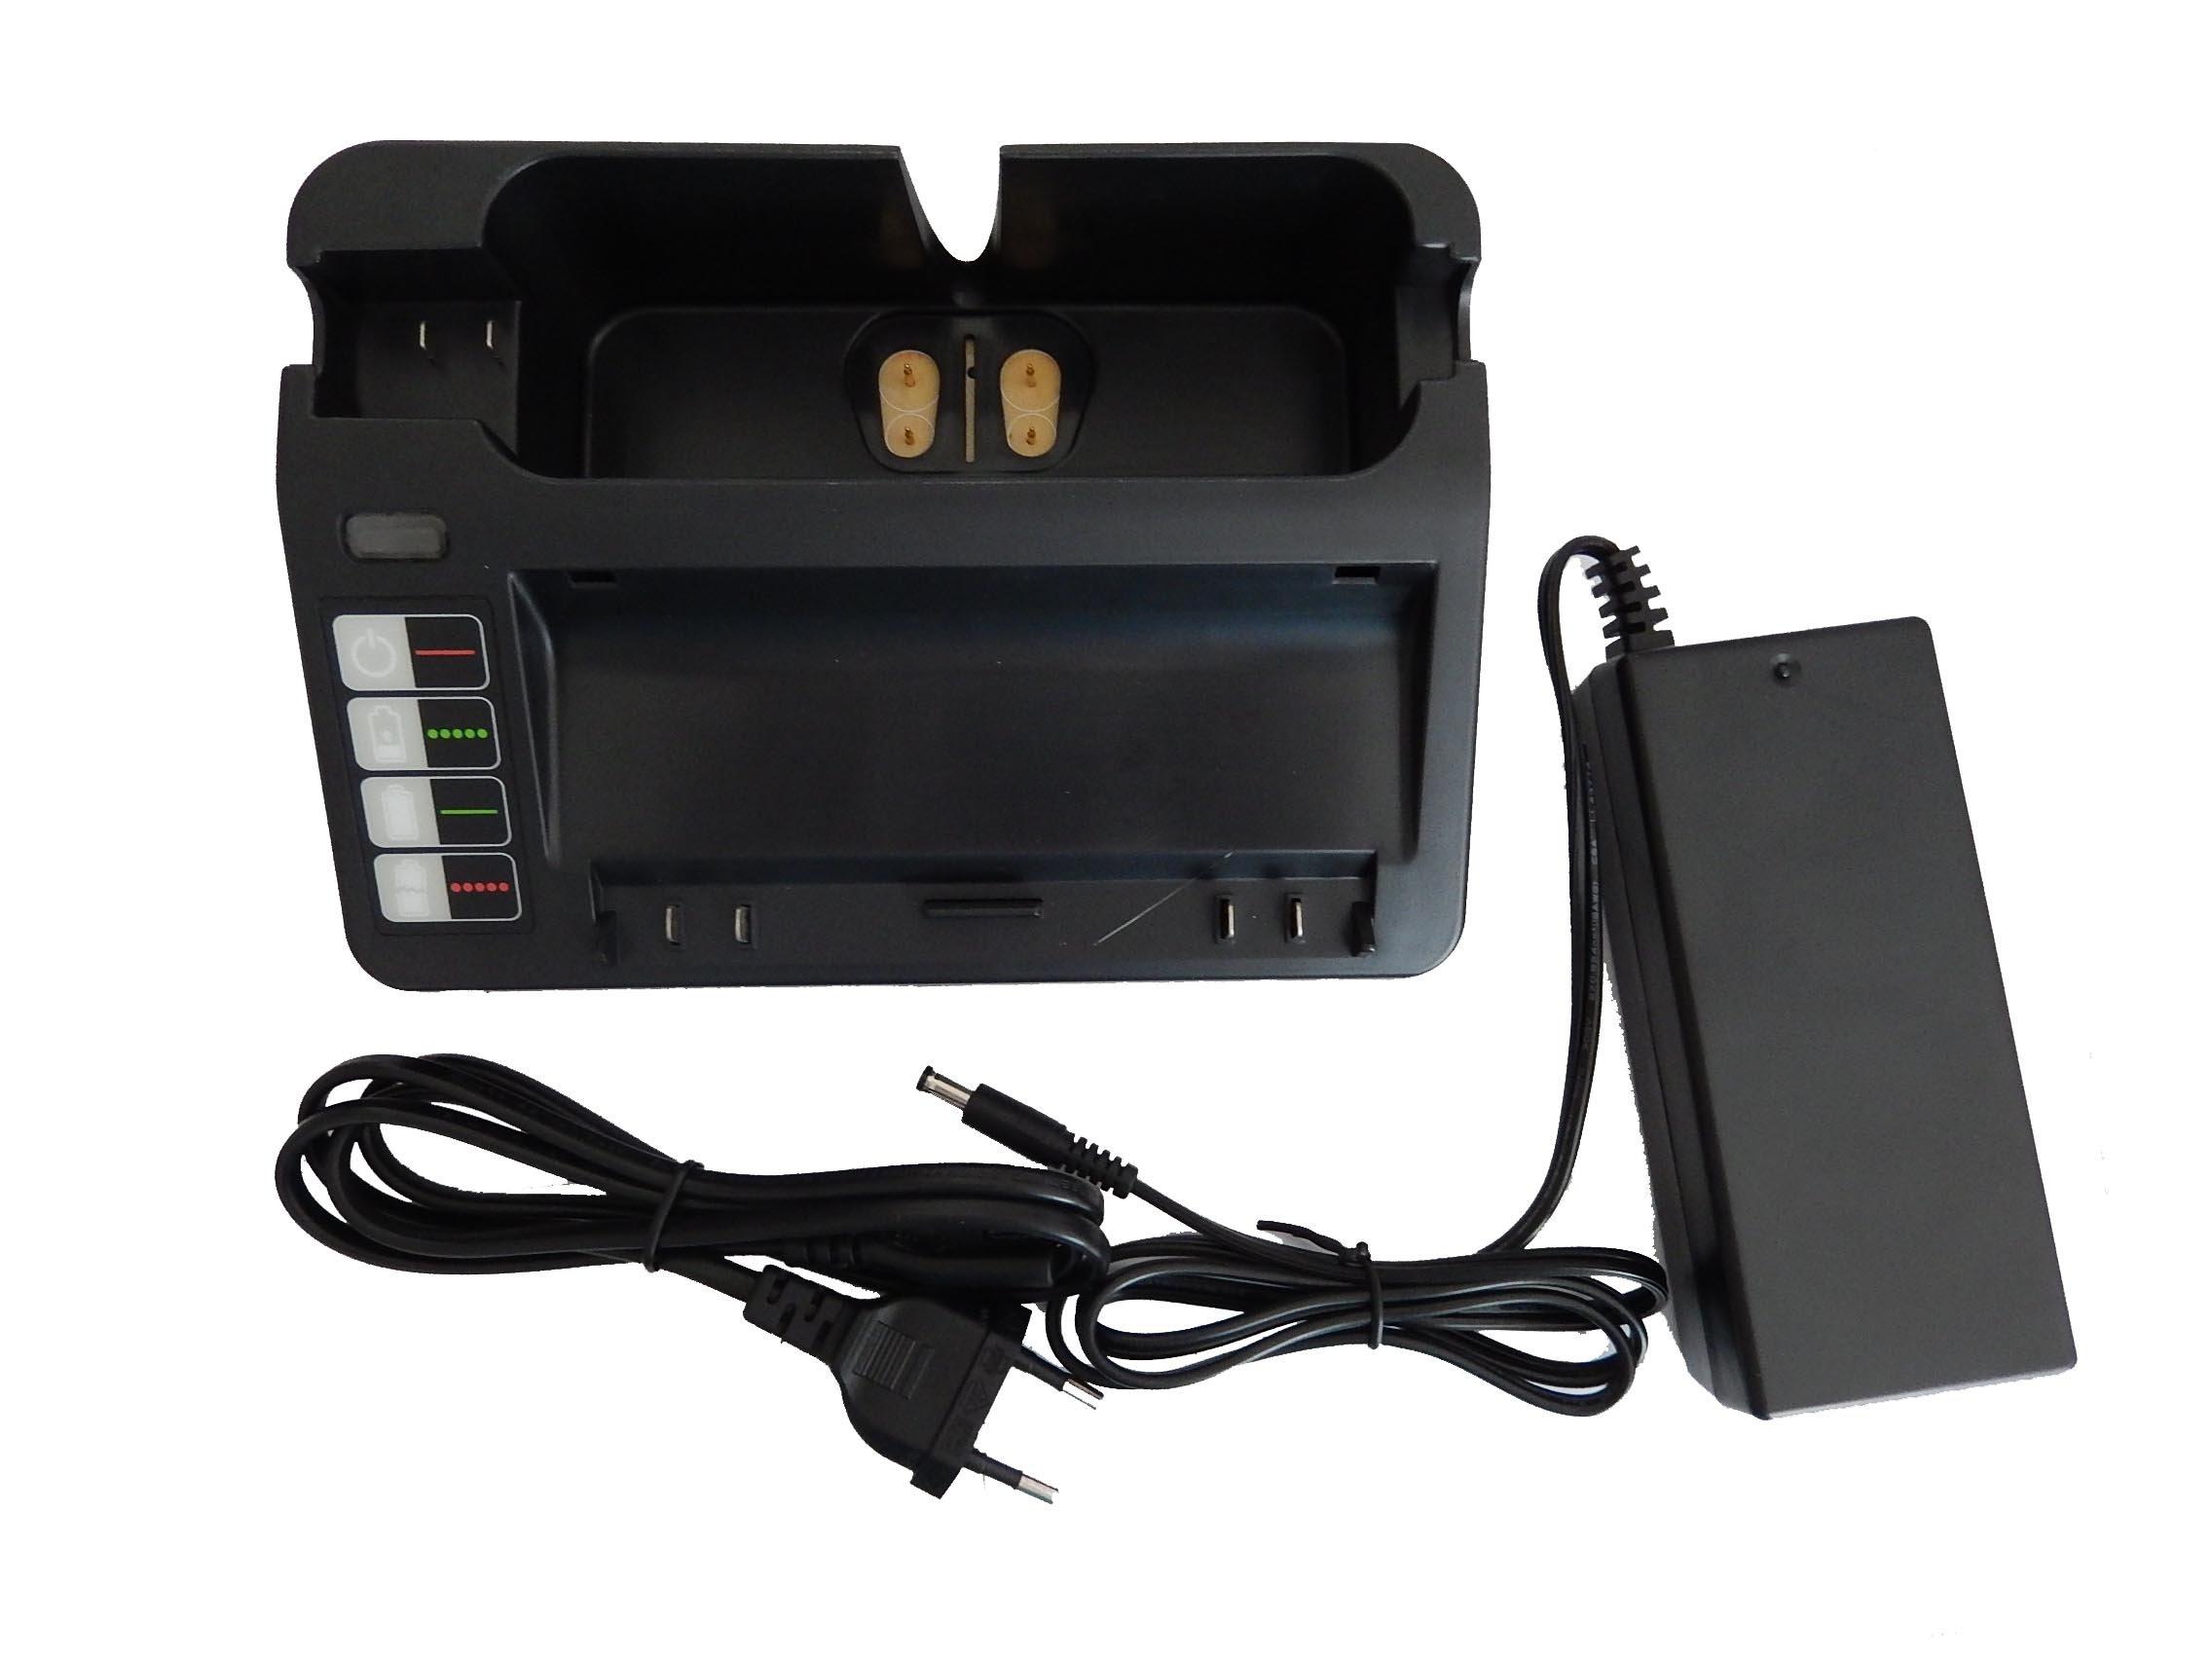 Caricabatterie vhbw 220V per Ryobi sostituisce iRobot Roomba 4230, 4232, Discovery 400